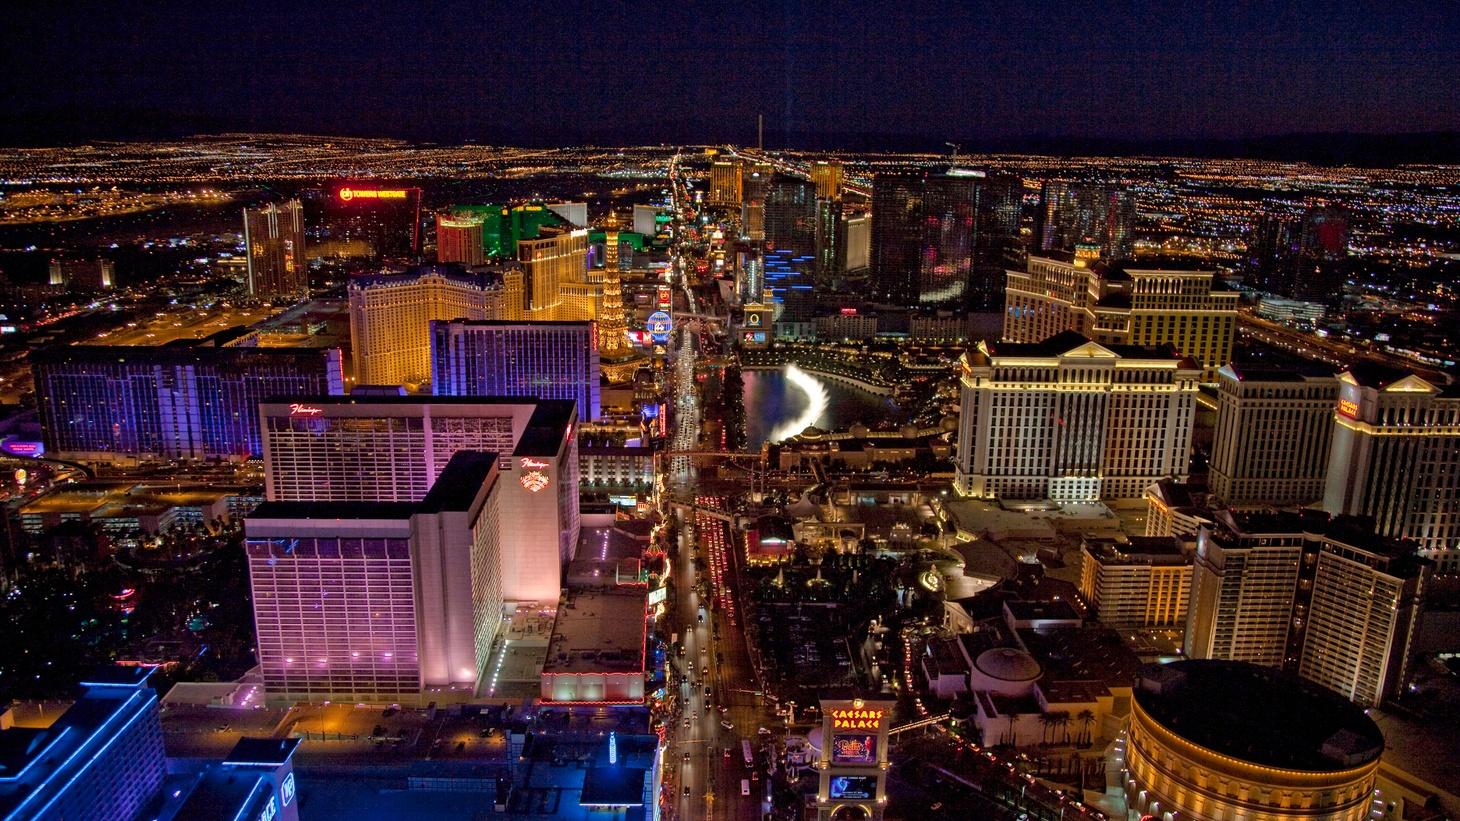 Las Vegas at night Photo by  Carol M.